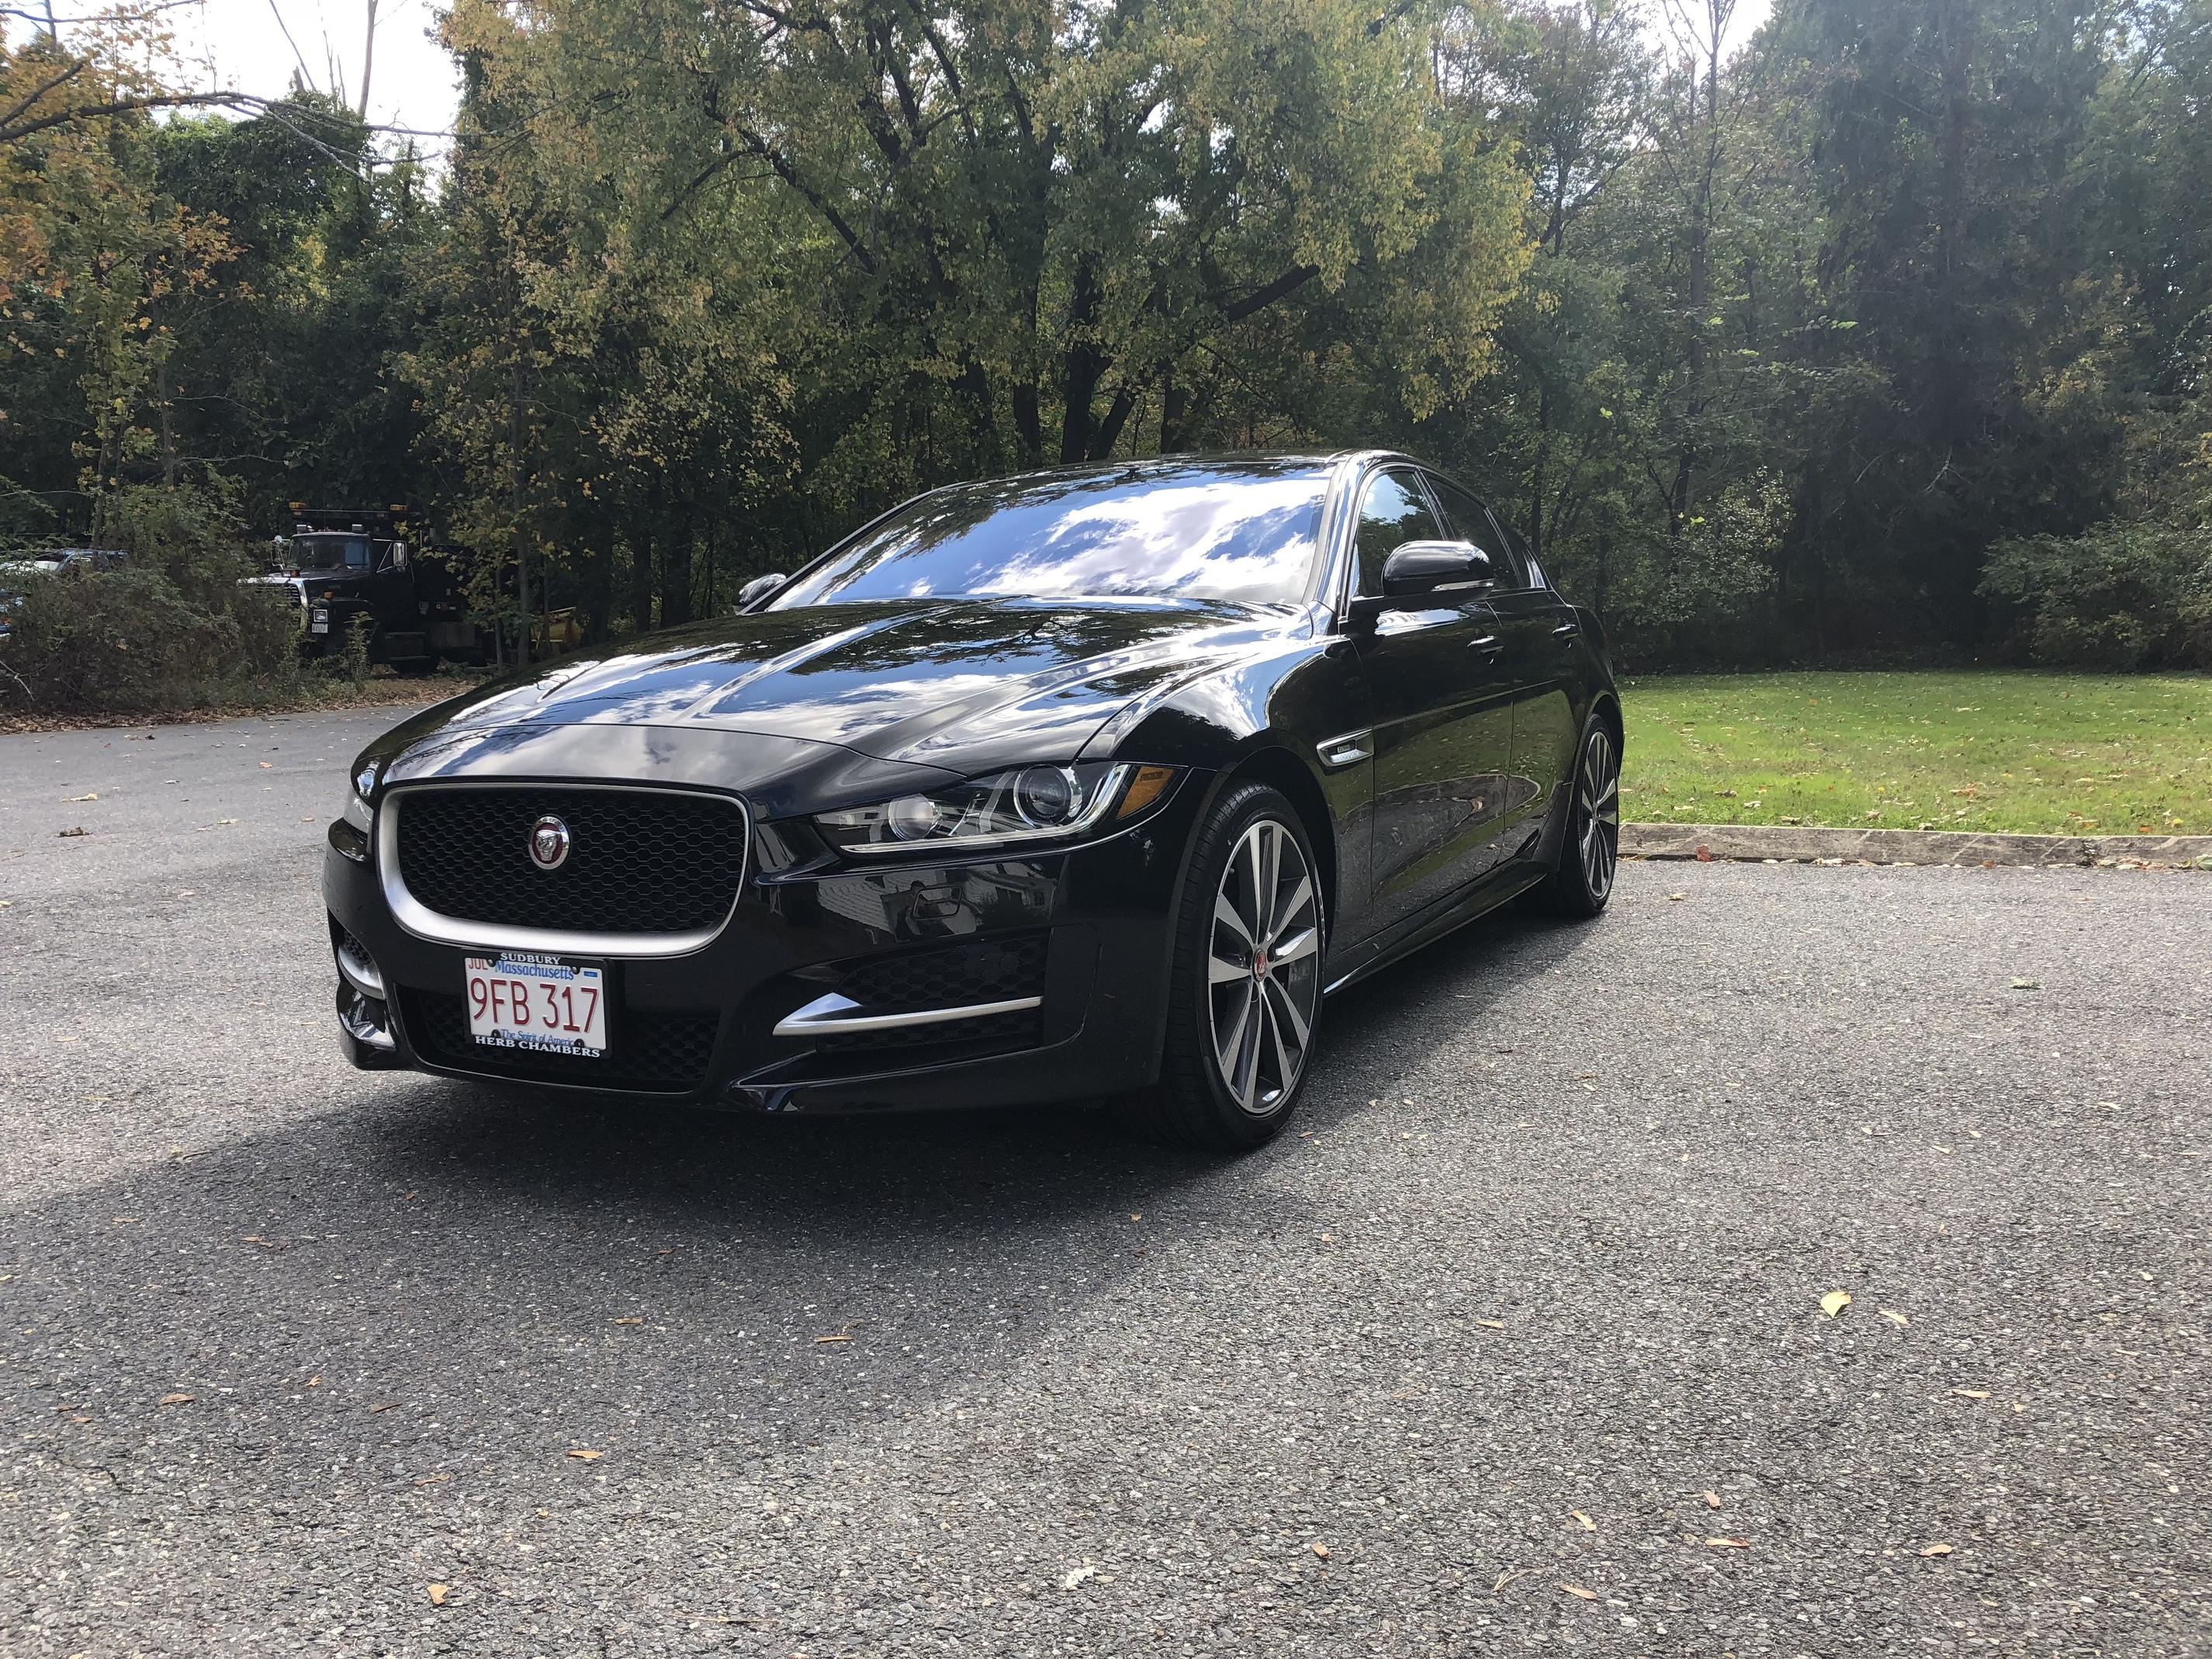 12222 Jaguar XE 25t R-Sport AT Lease $499 Mo